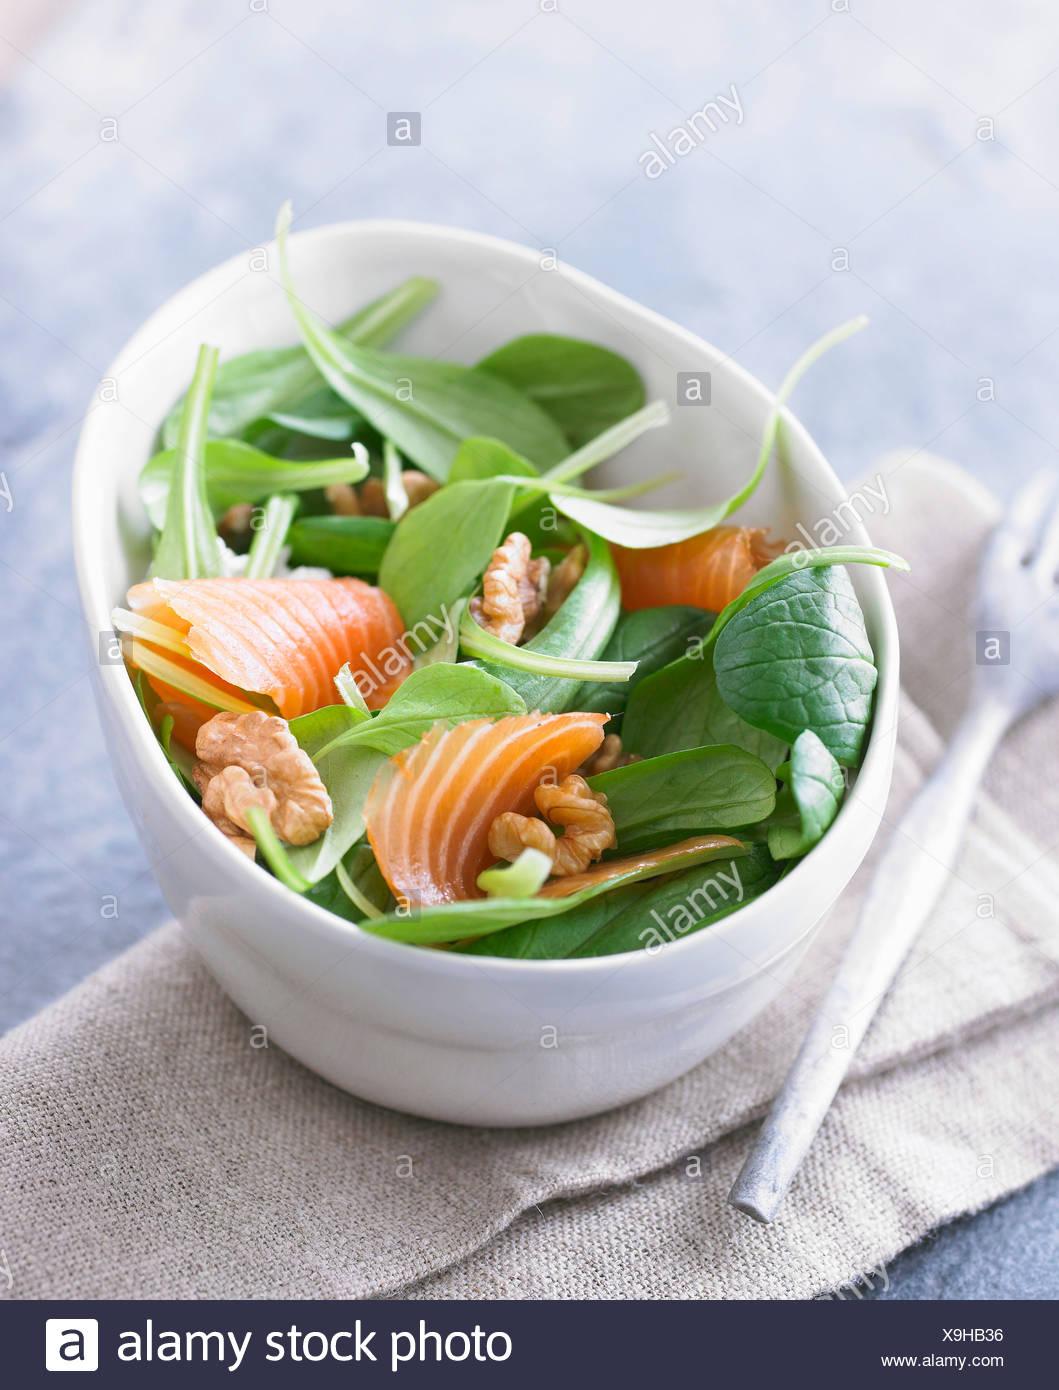 Corn salad,salmon and walnut salad - Stock Image